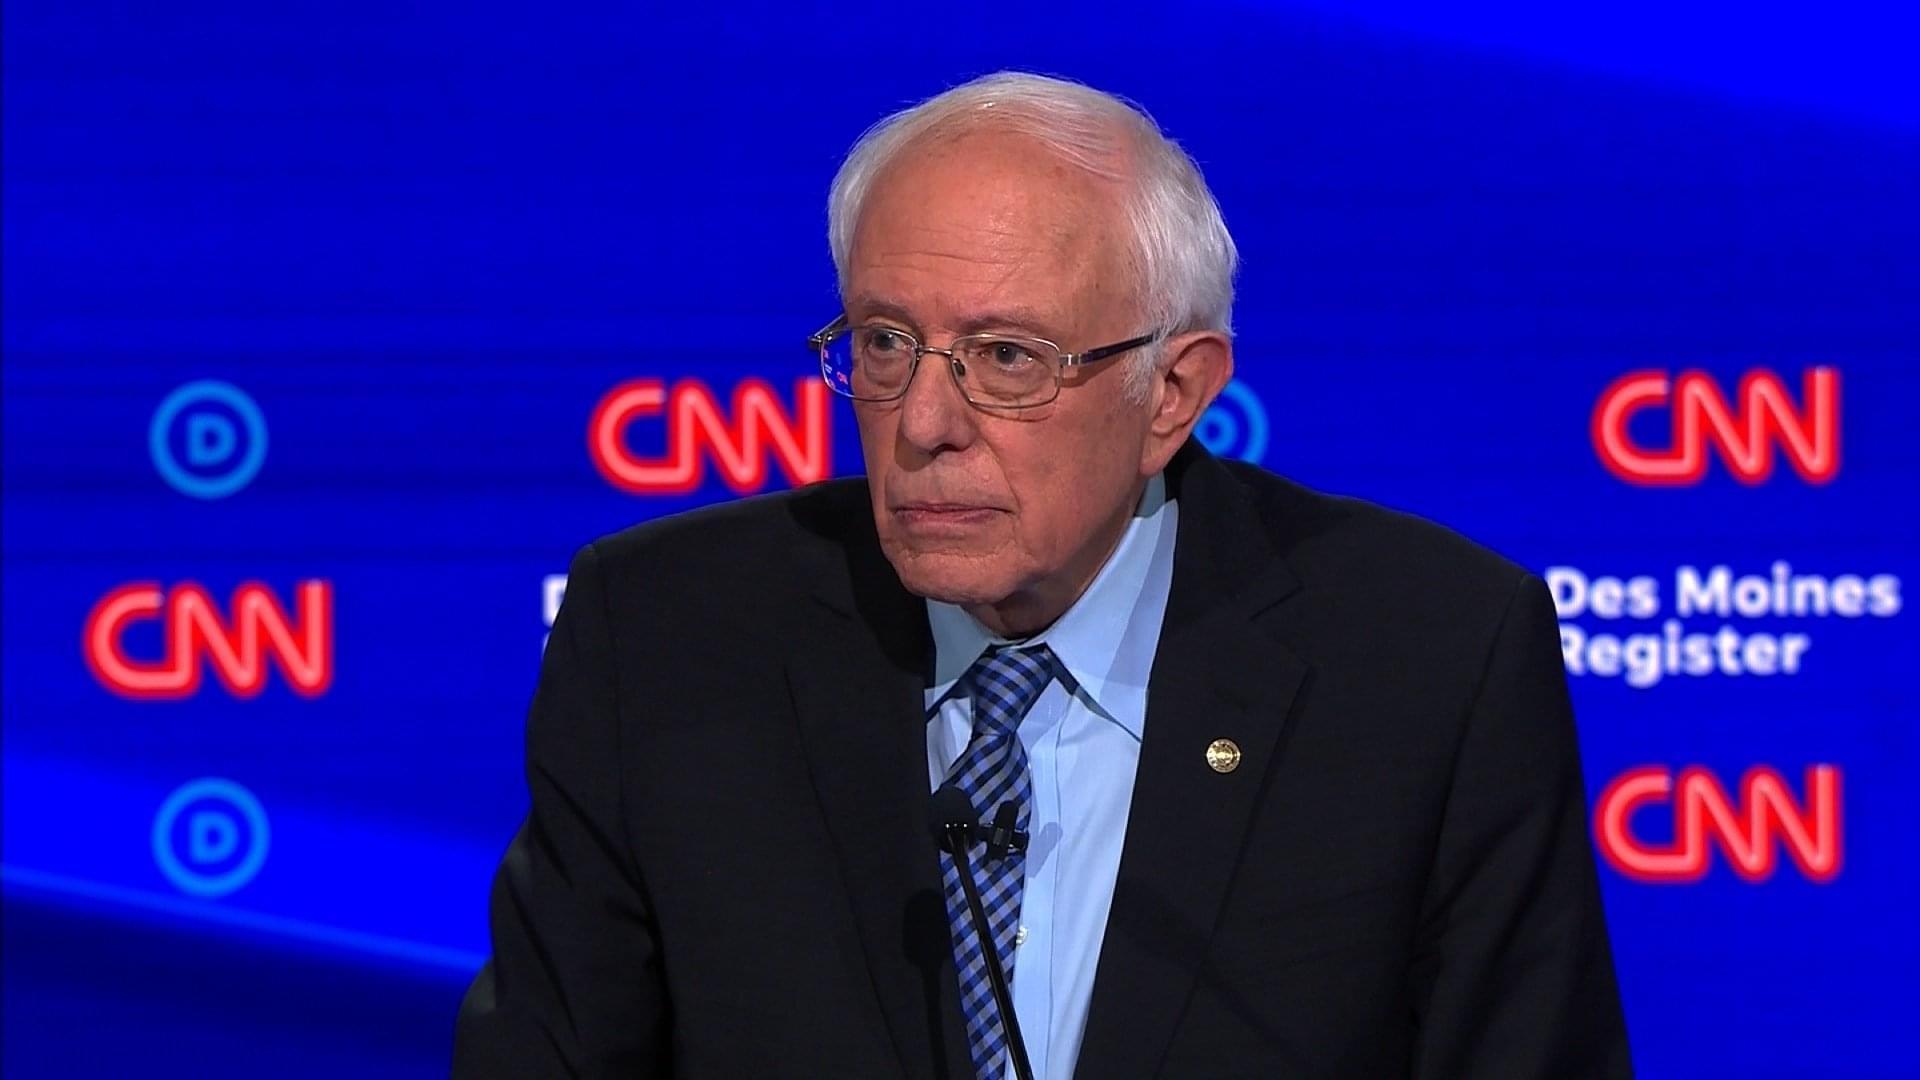 Chris Salcedo Show: Bernie Sanders Wins Nevada, and Dems Should be Worried